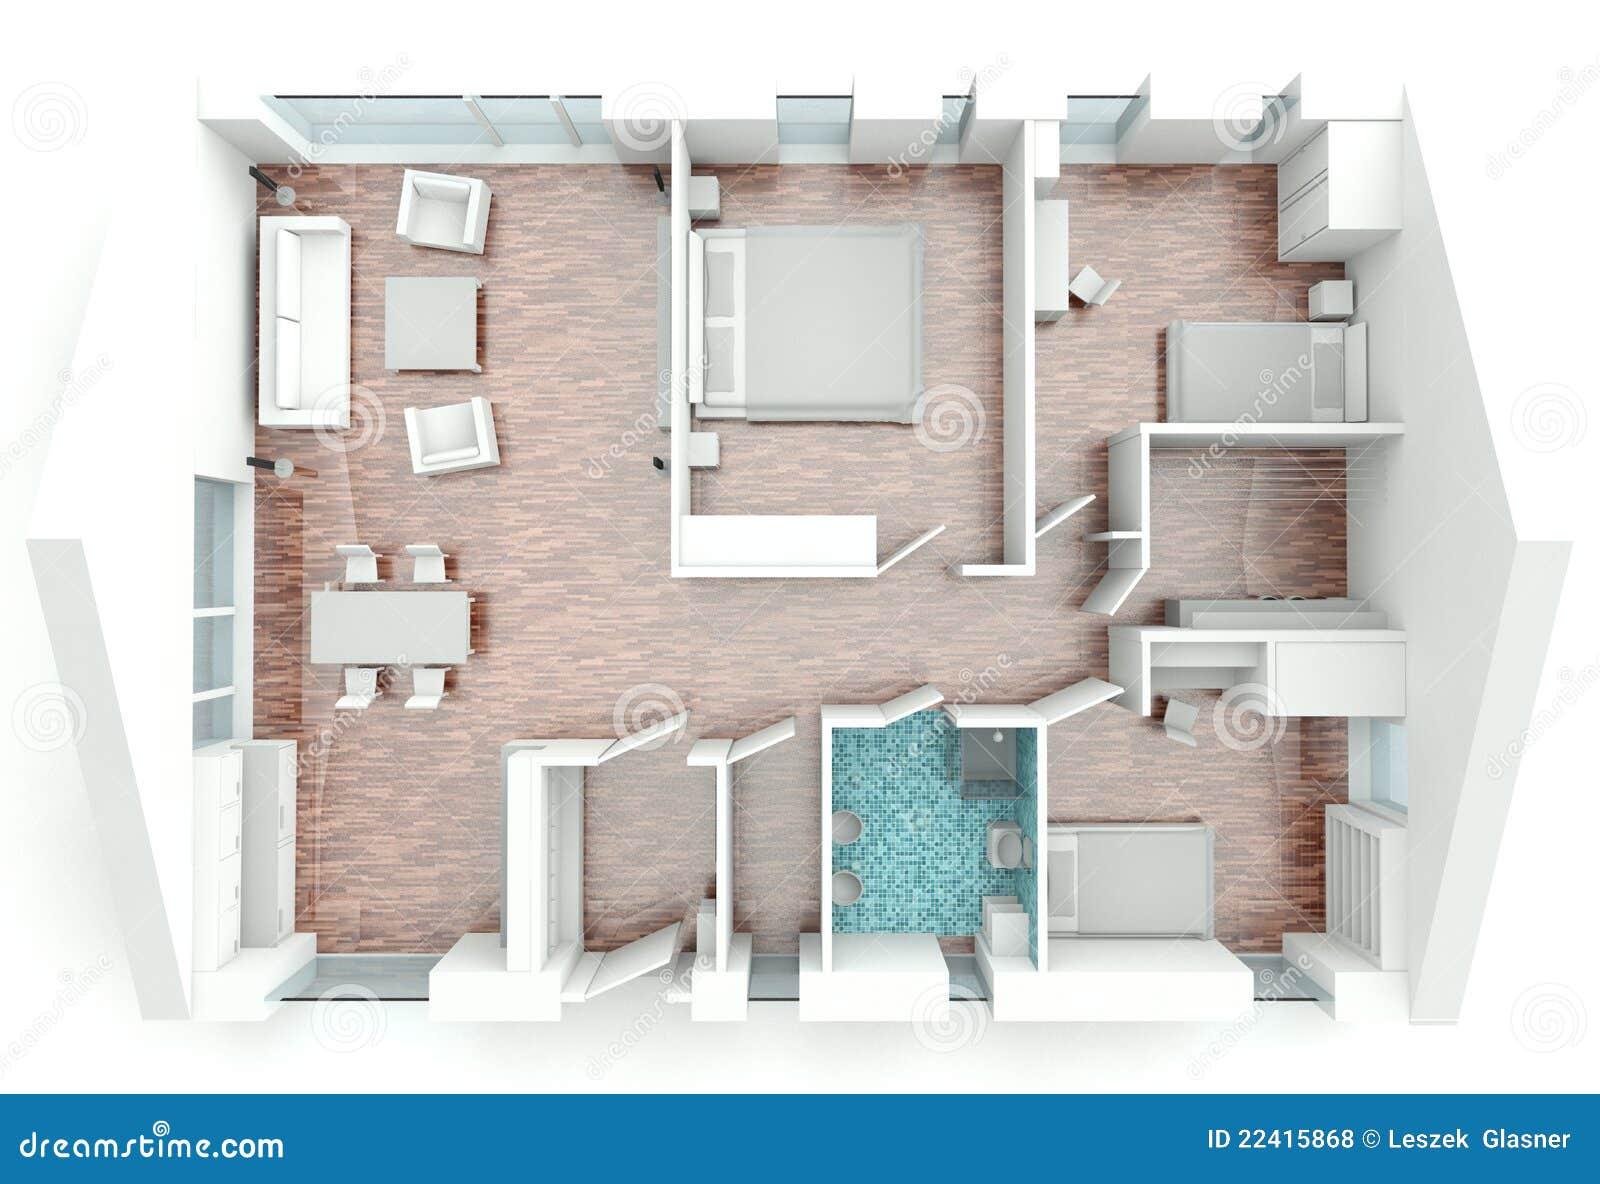 Hauspläne 3d  Grundriss stock abbildung. Illustration von fußboden - 28241313